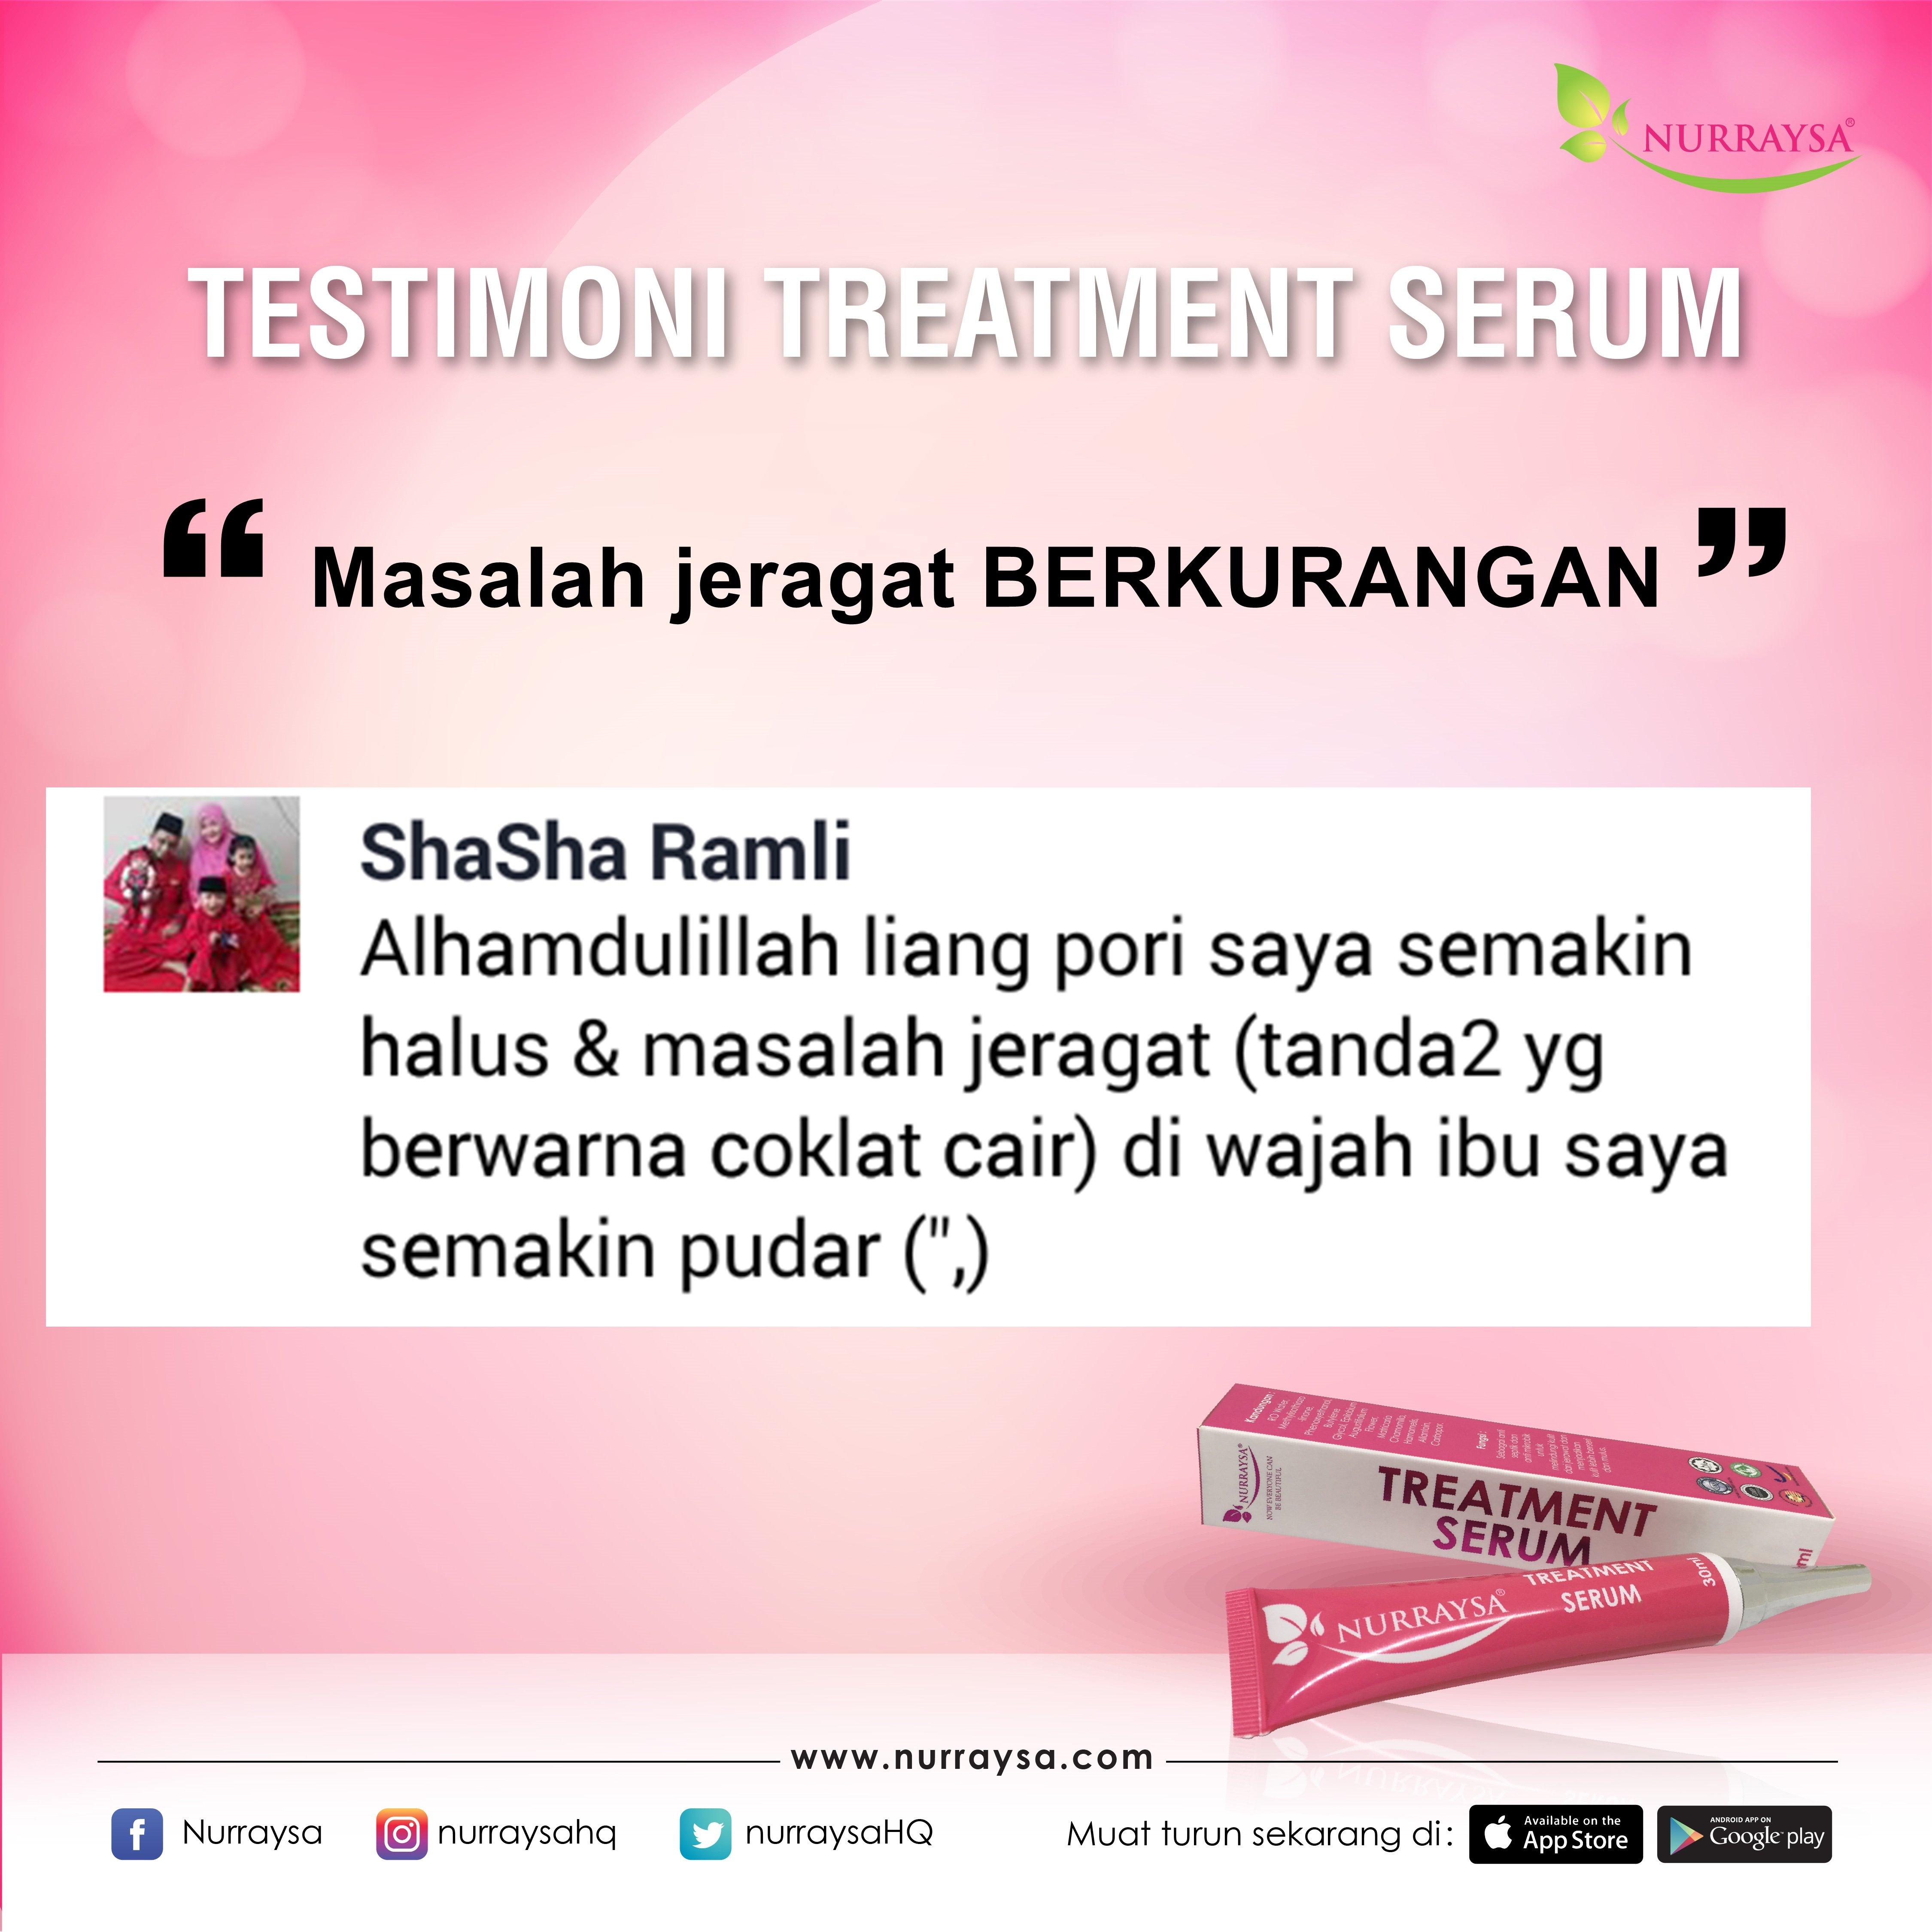 Testimoni Treatment Serum 2